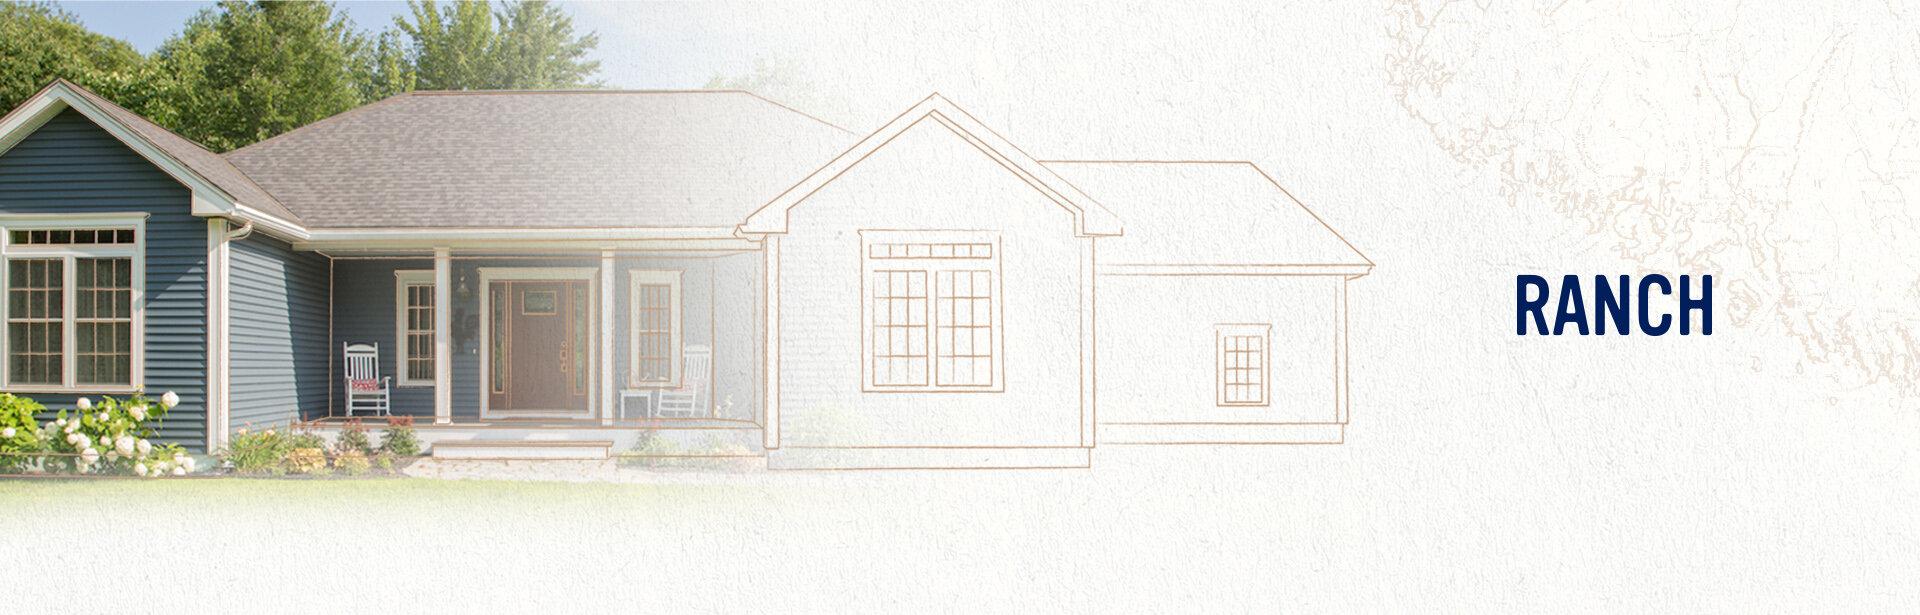 New-Home-Designs-Banner-Ranch (1).jpg